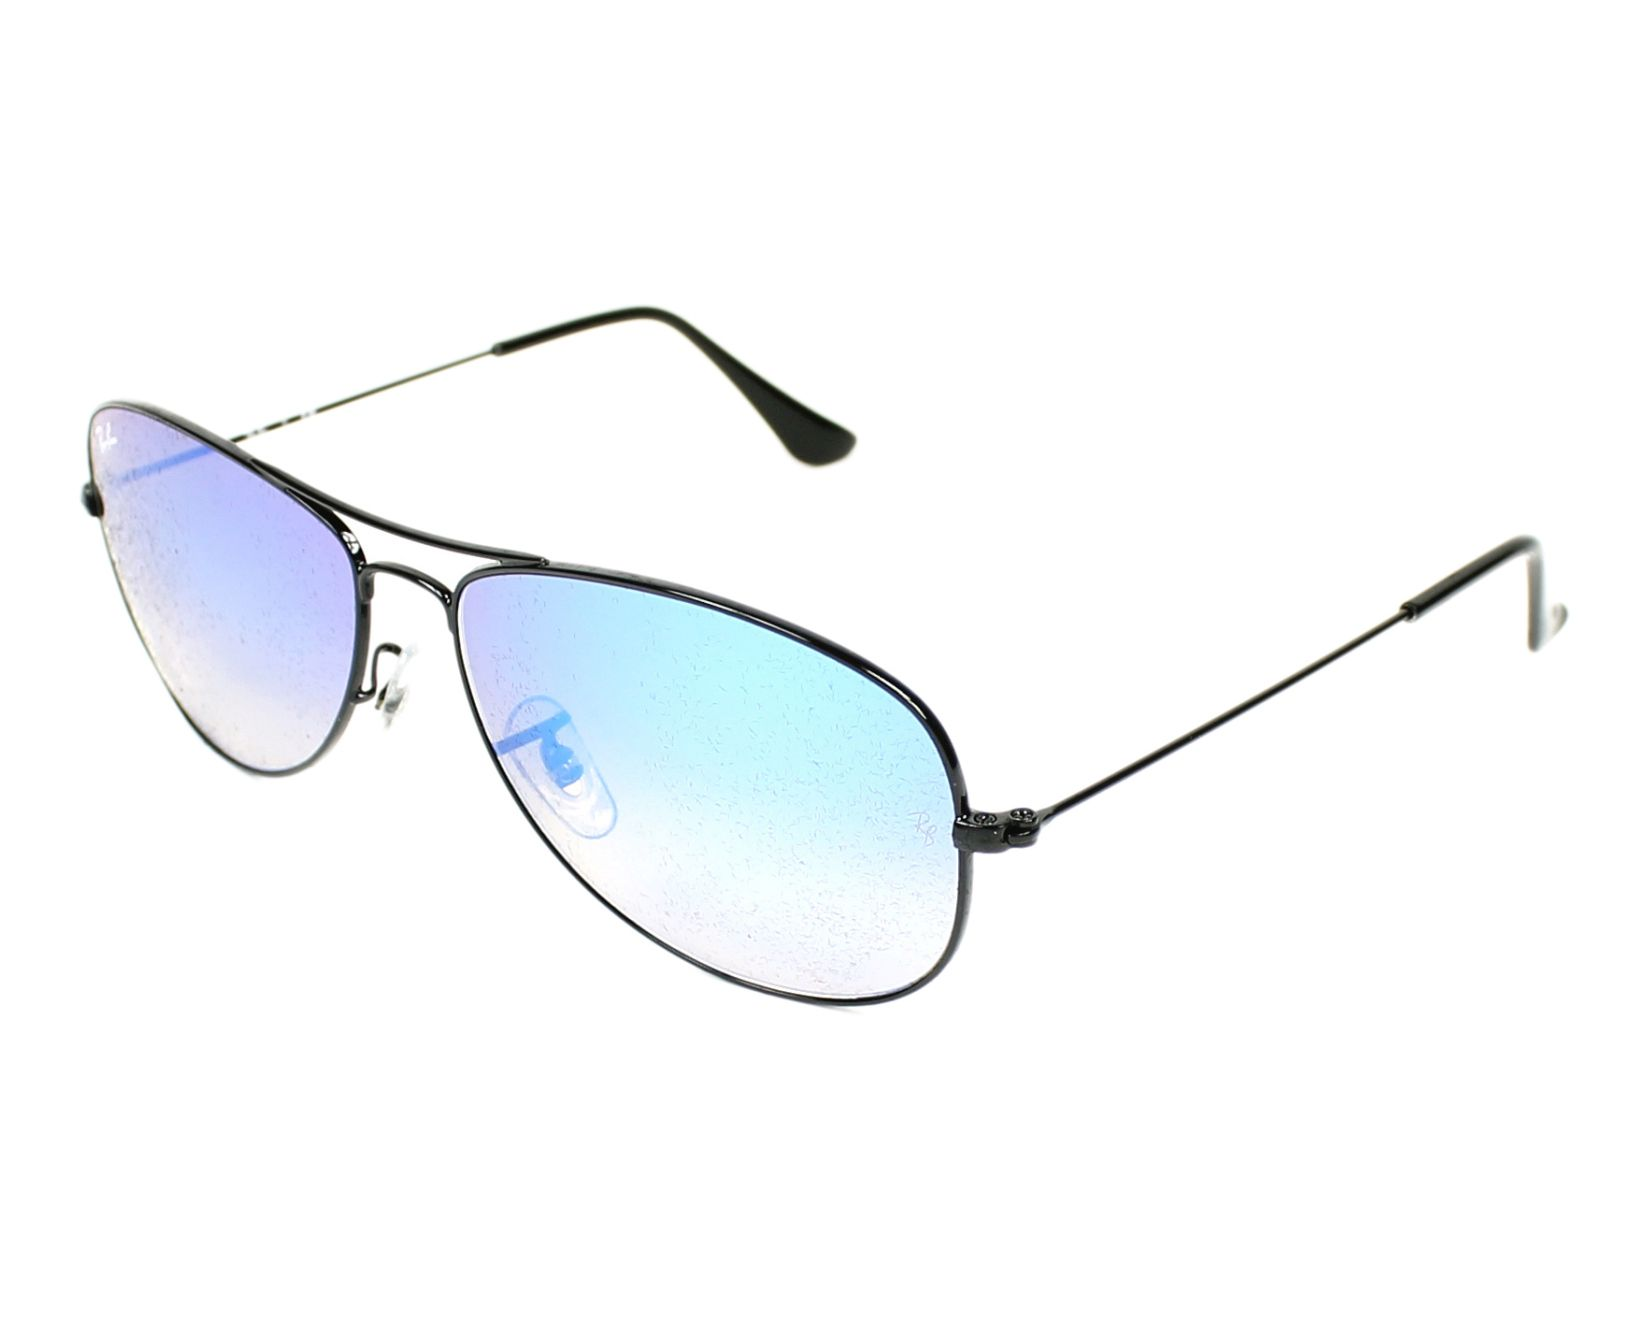 ray ban sunglasses cockpit rb 3362 002 40 59 visionet. Black Bedroom Furniture Sets. Home Design Ideas